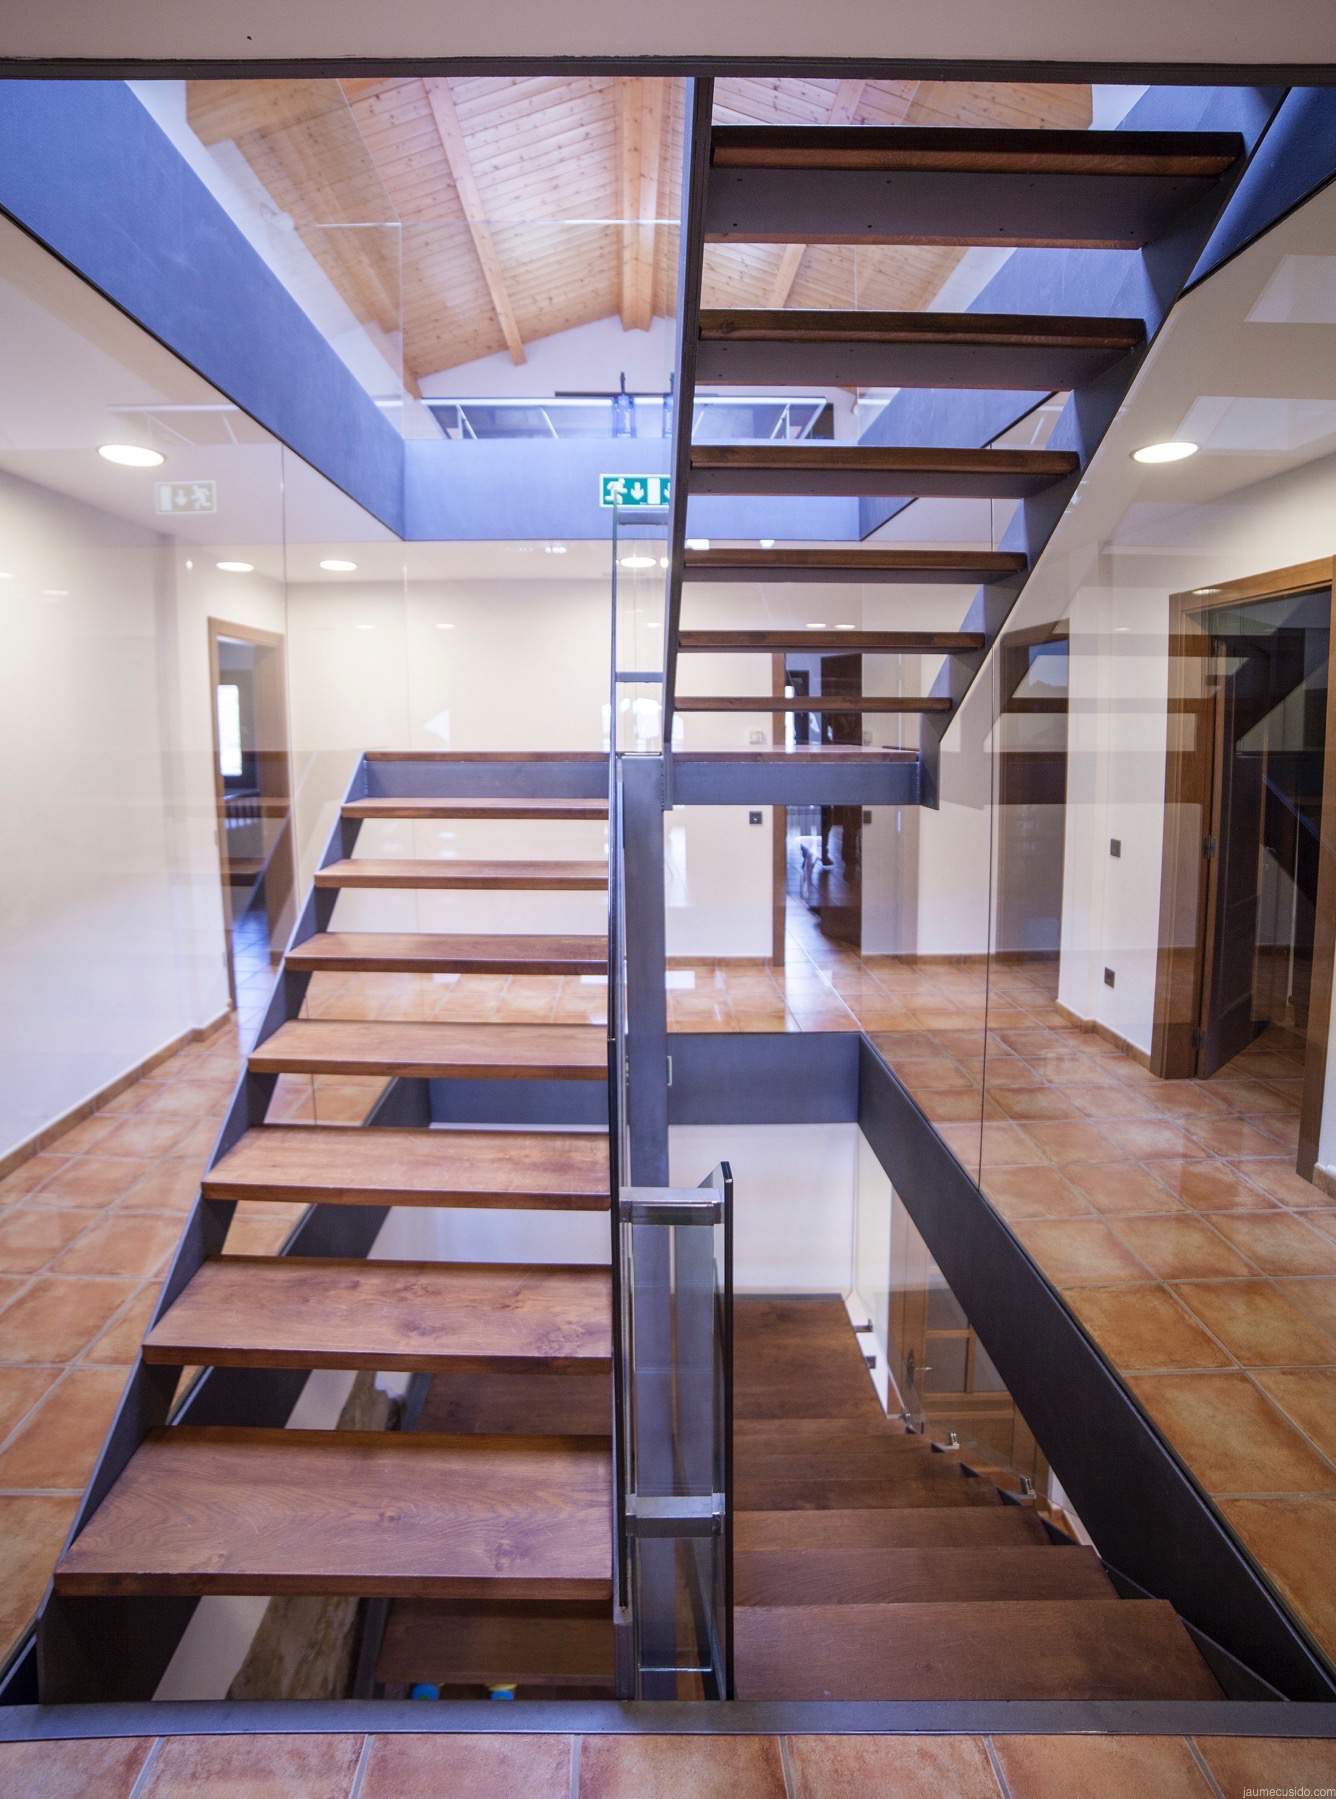 Ideas para cerrar hueco escalera best ob recibidor con for Aprovechar hueco escalera duplex